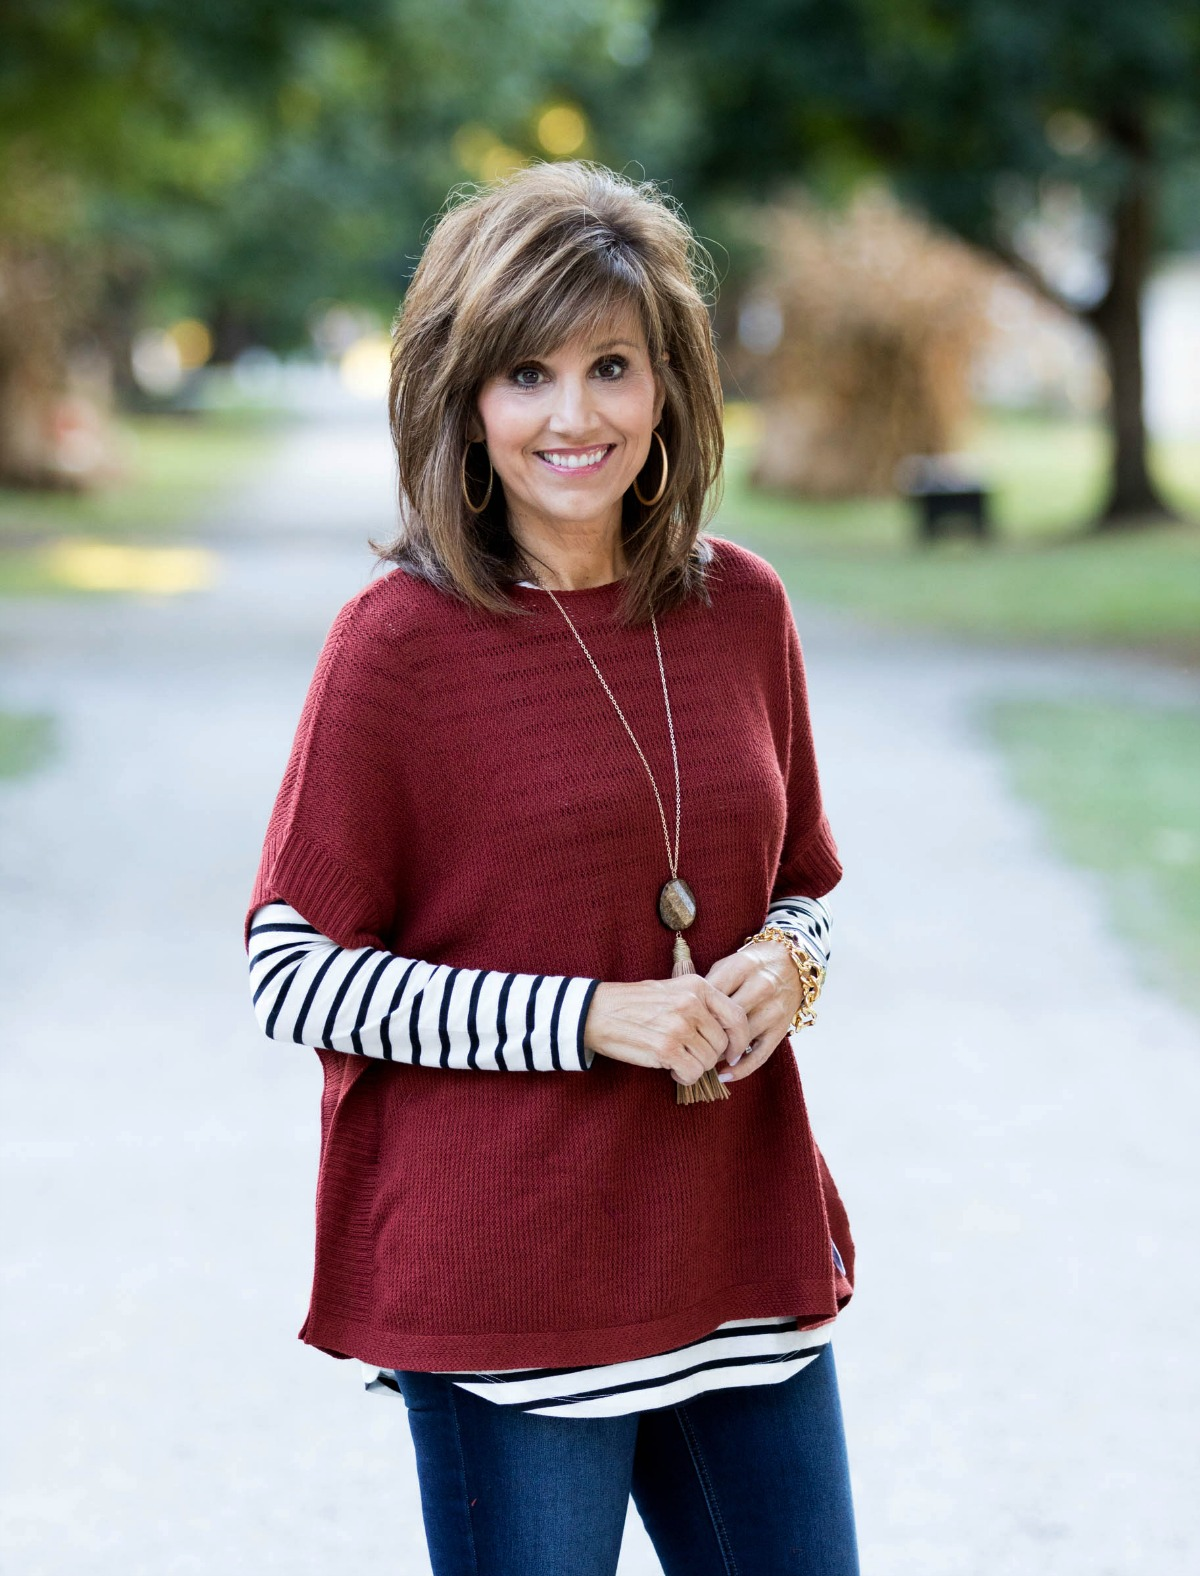 Fall Fashion-Poncho Sweater & Stripe Tee